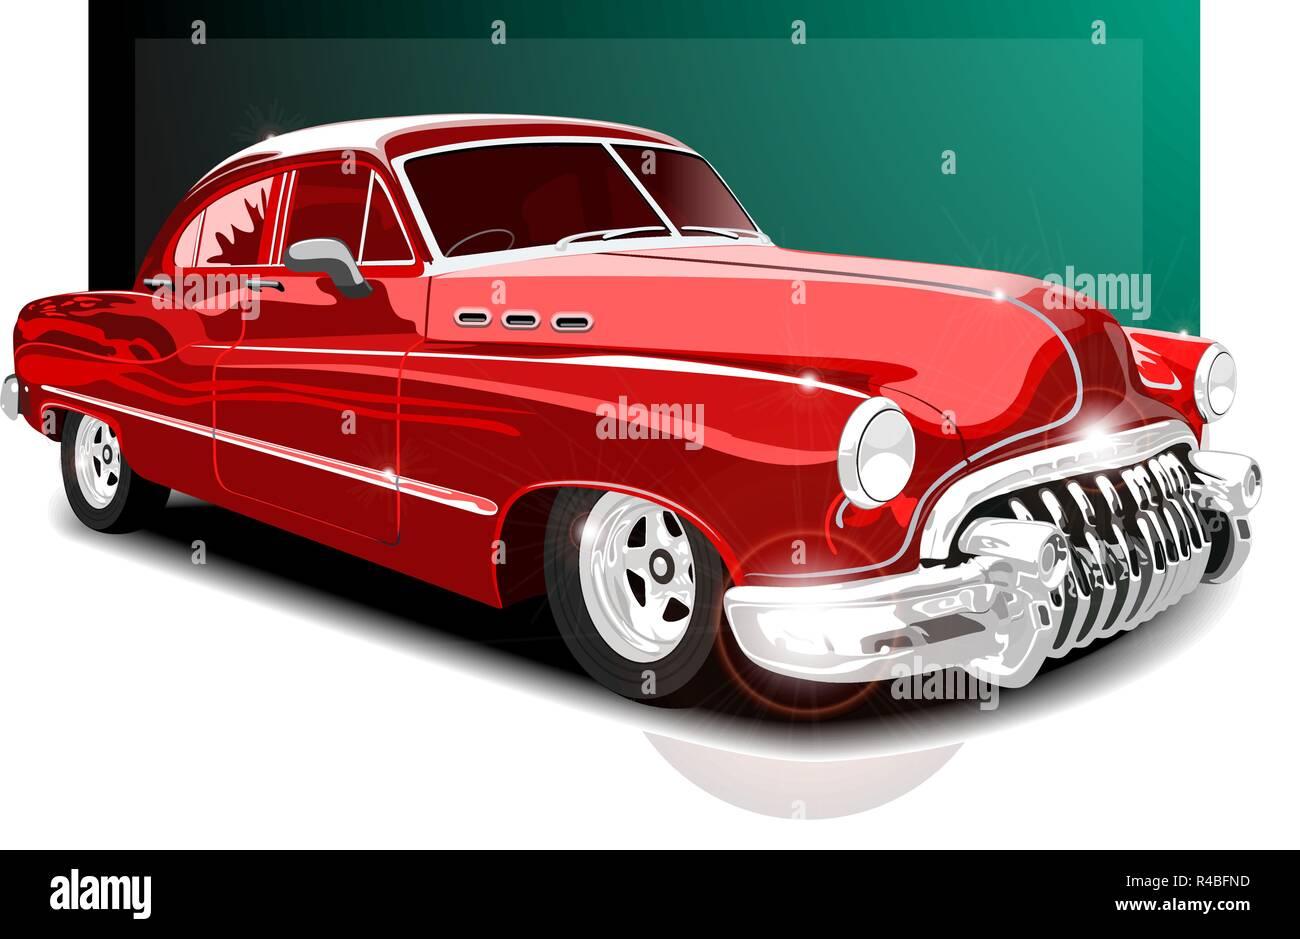 vector illustartion vintage red car. retro car - Stock Vector